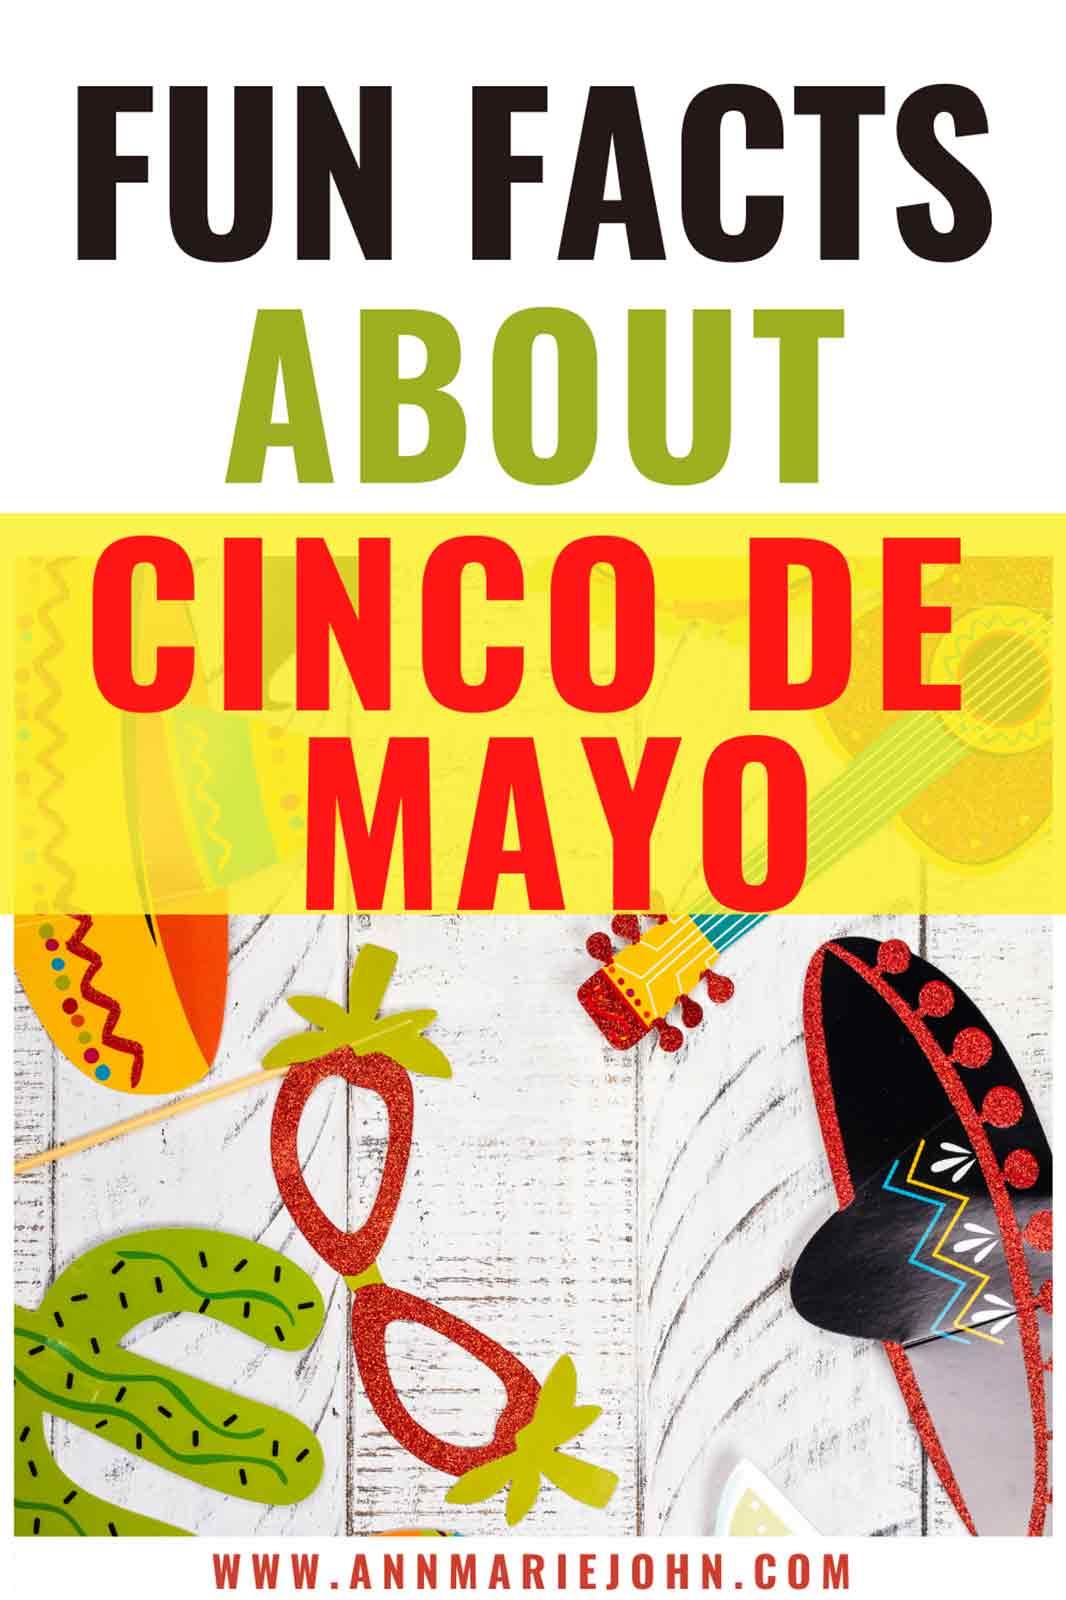 Fun Facts About Cinco de Mayo